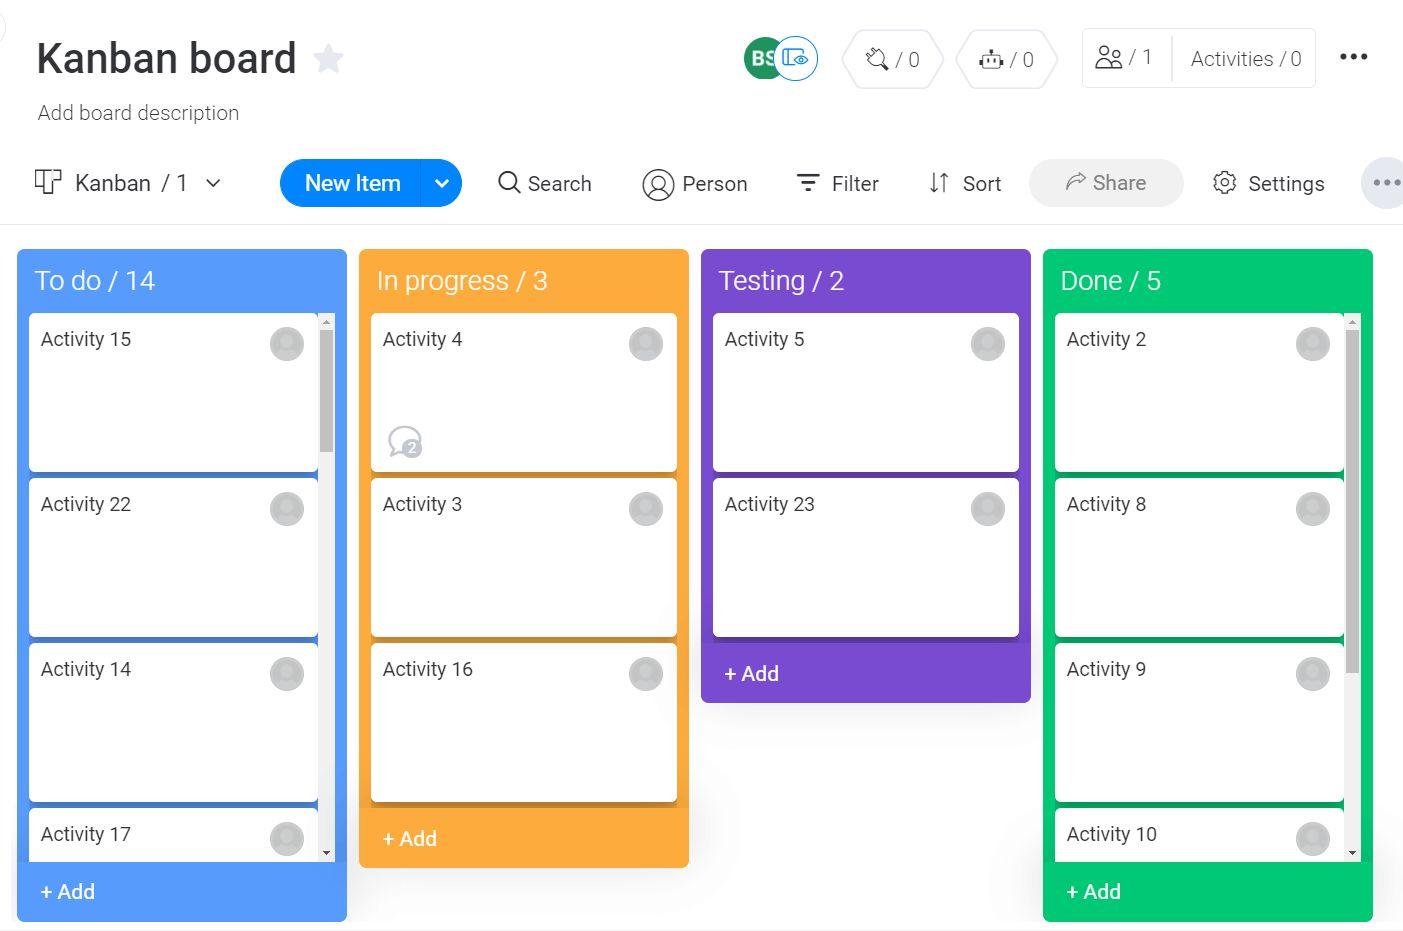 A screenshot showing an example of a kanban board